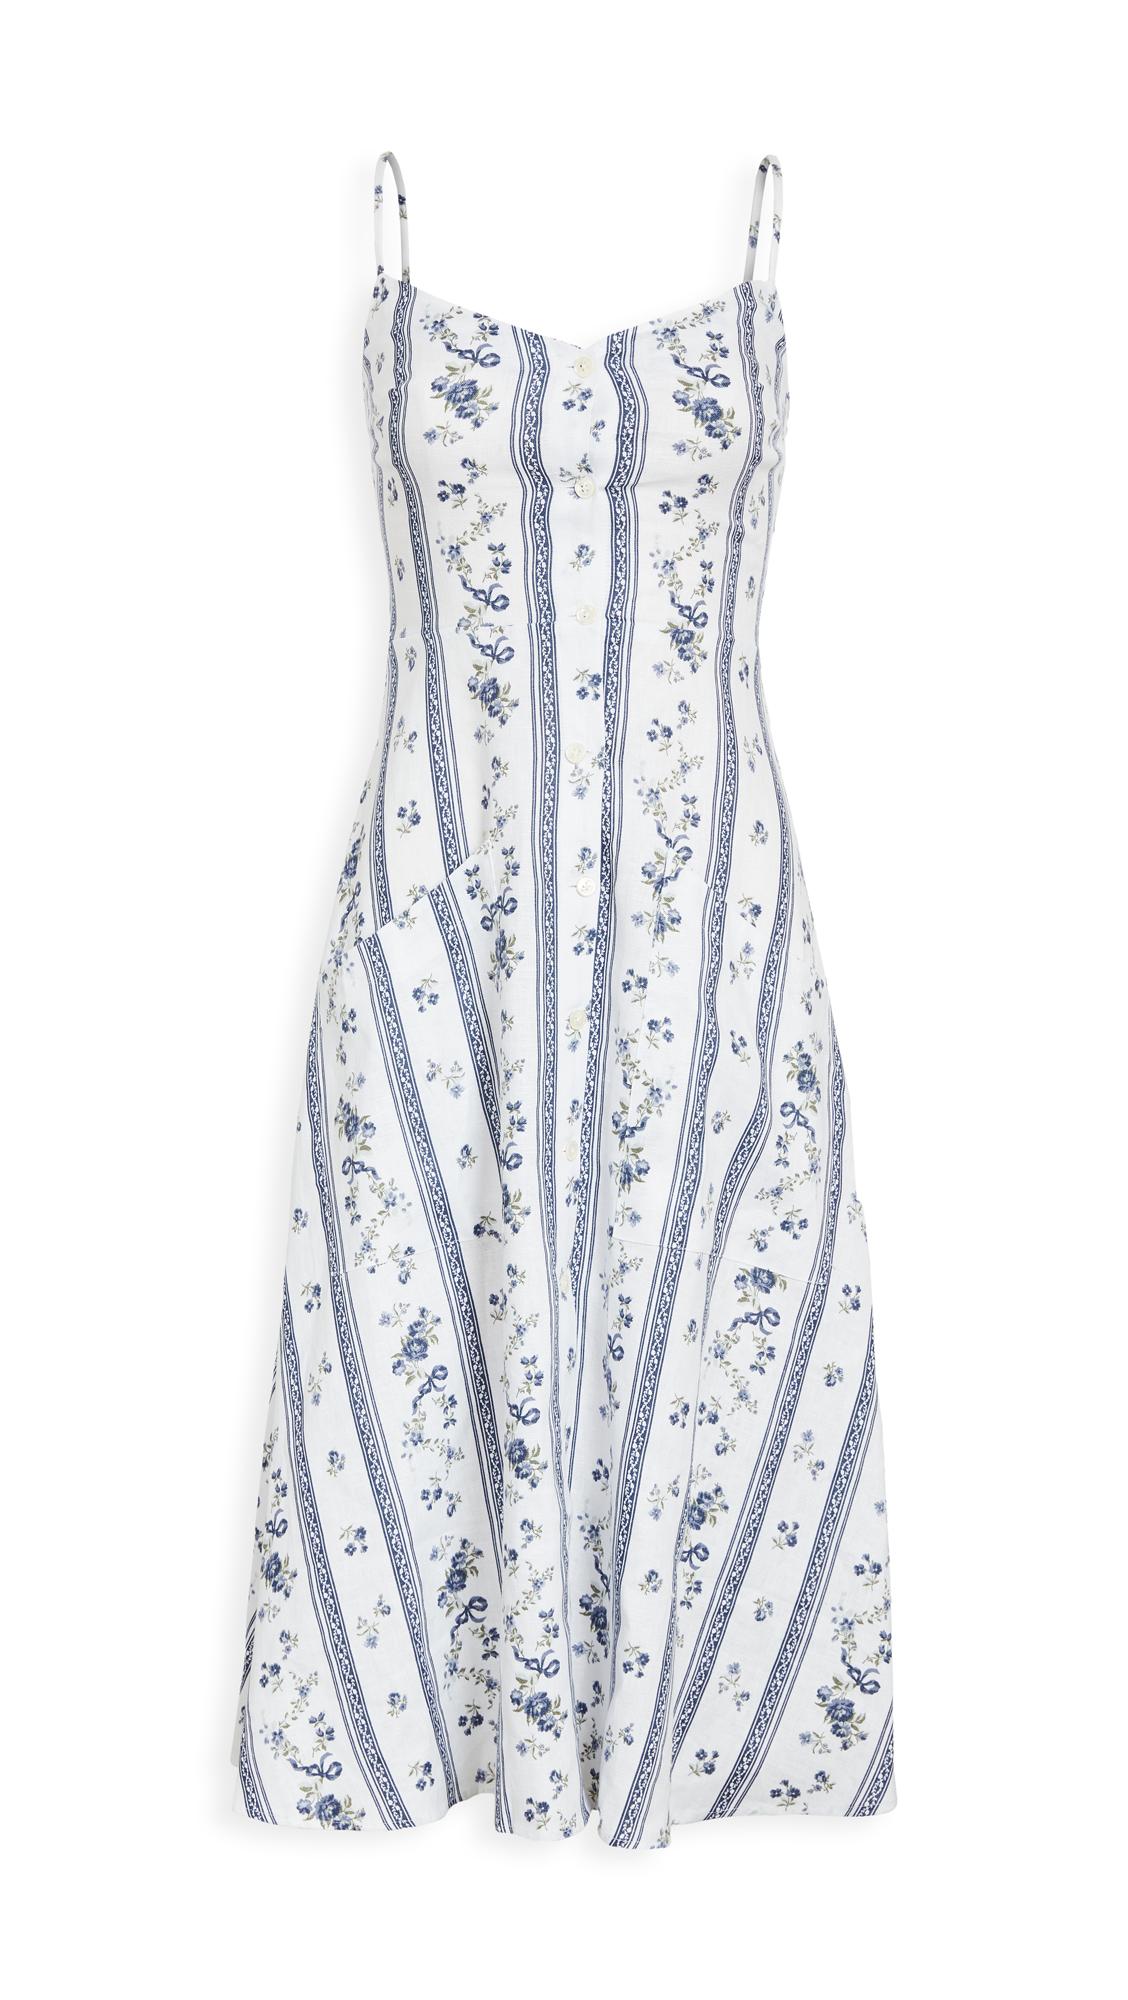 Reformation Parke Dress